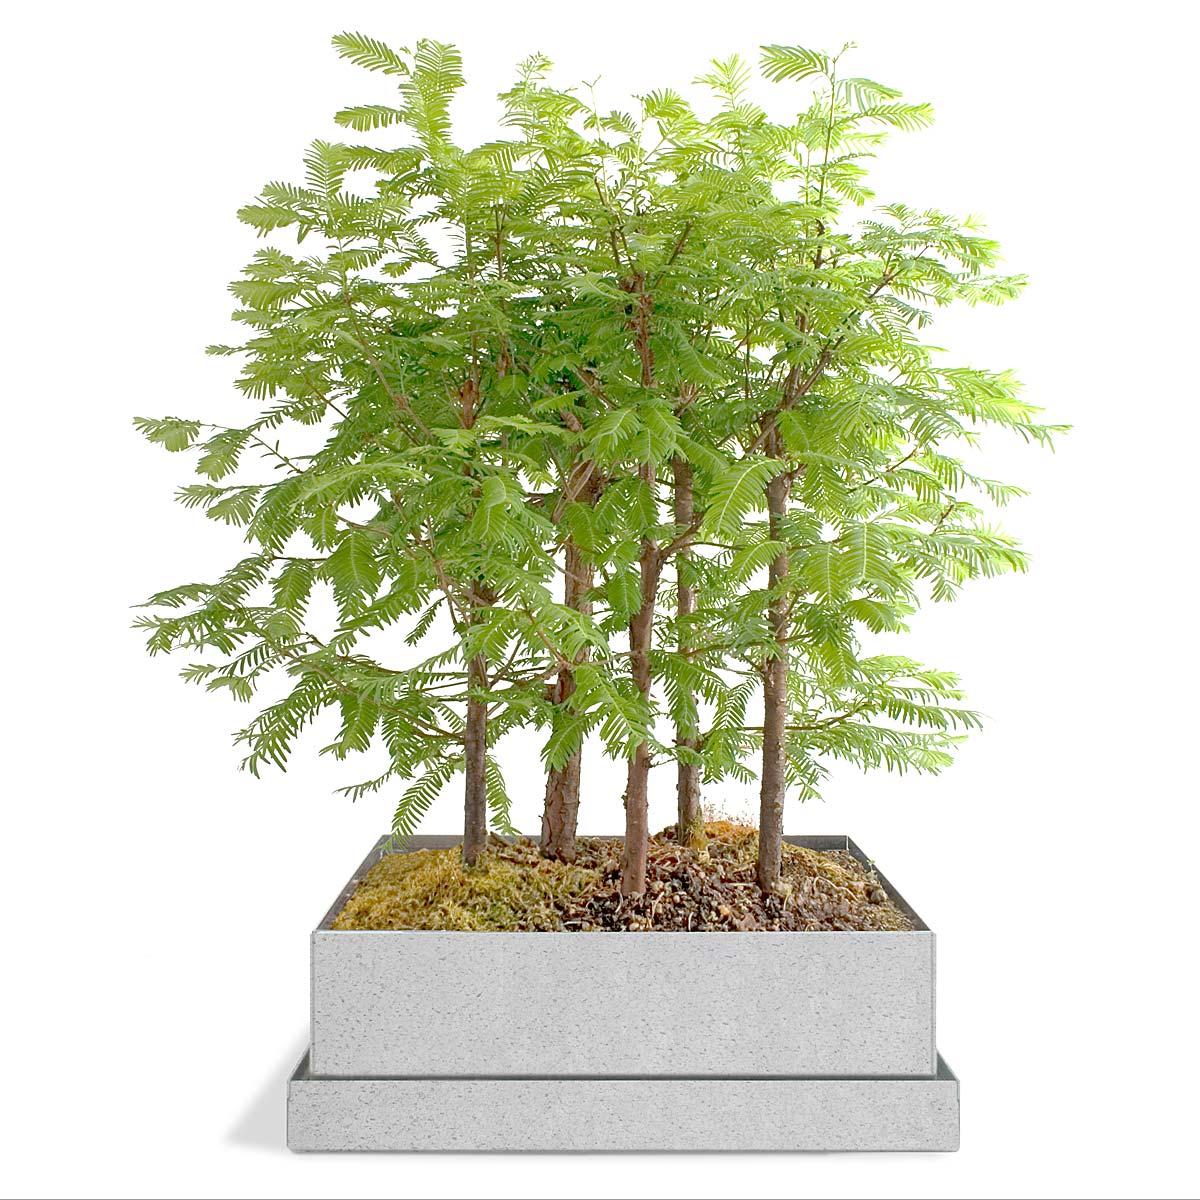 Amazing Bonsai Trees: Bonsai Tree Gift Kit